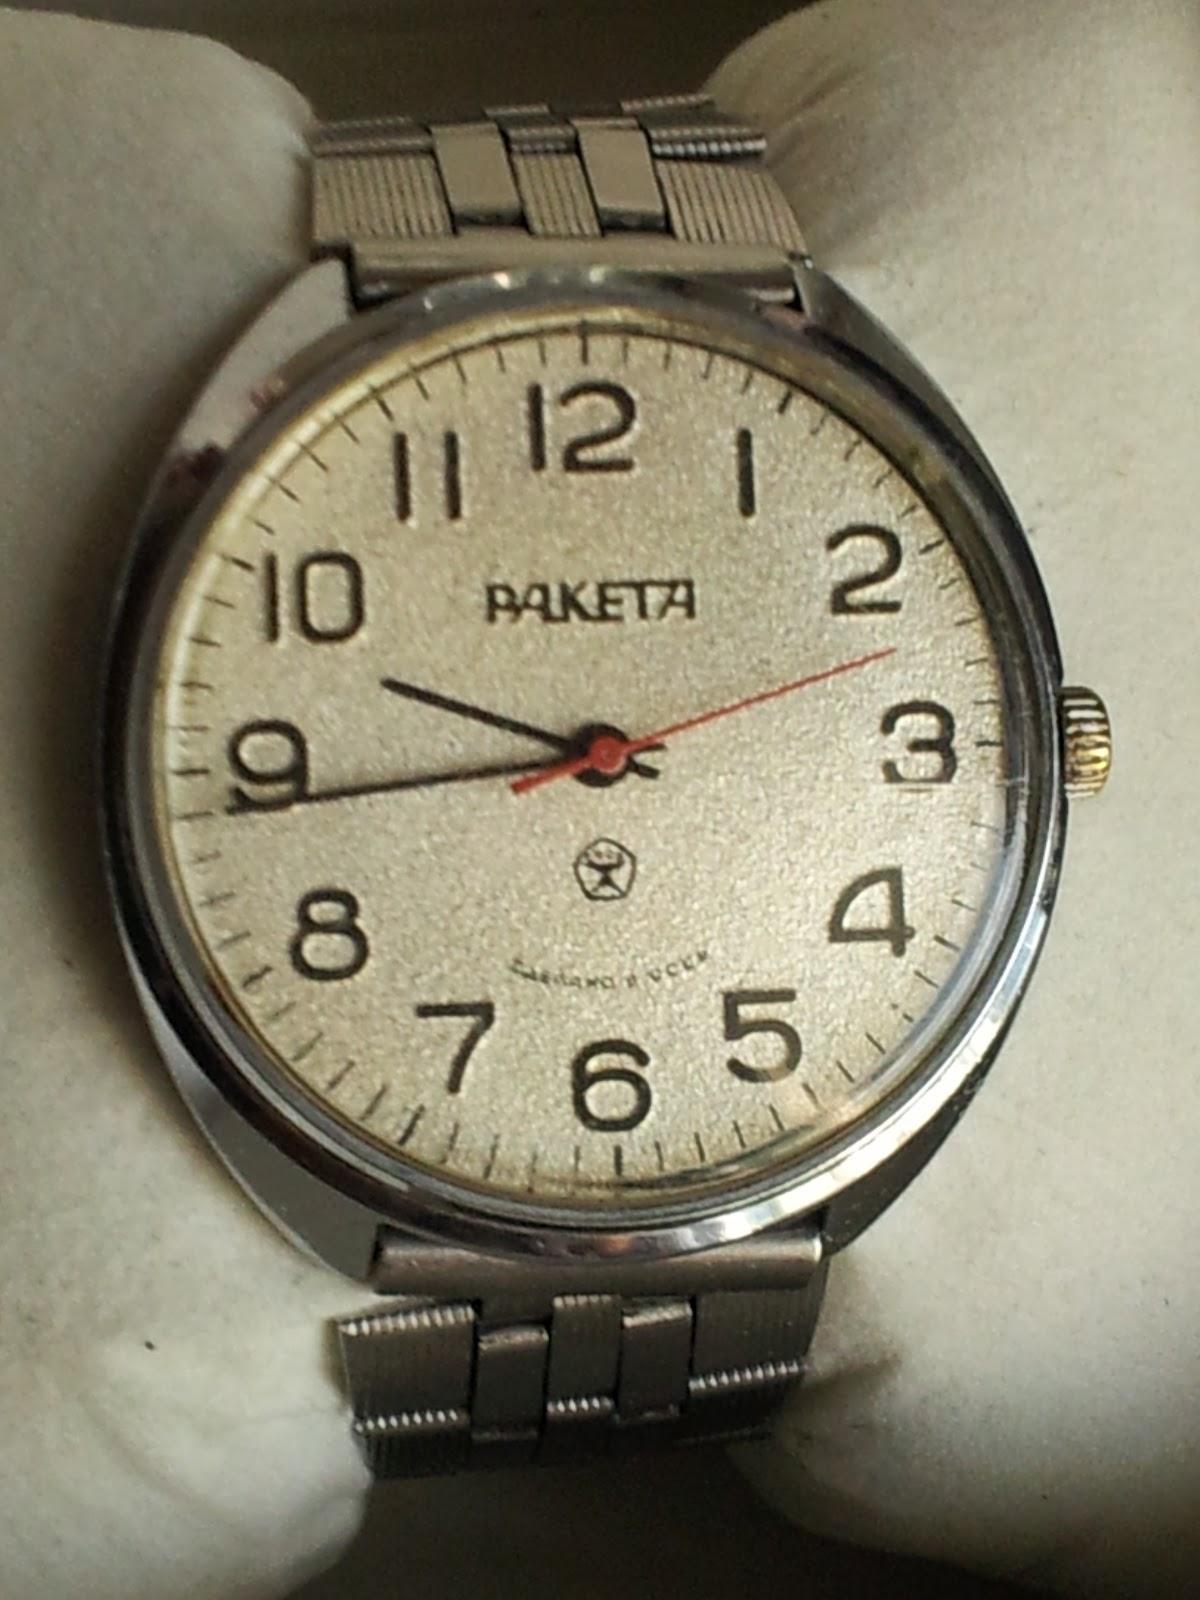 Perpetual Calendar Watch >> Soviet Russian Timepieces - Poljot, Raketa, Vostok: Raketa - Paketa